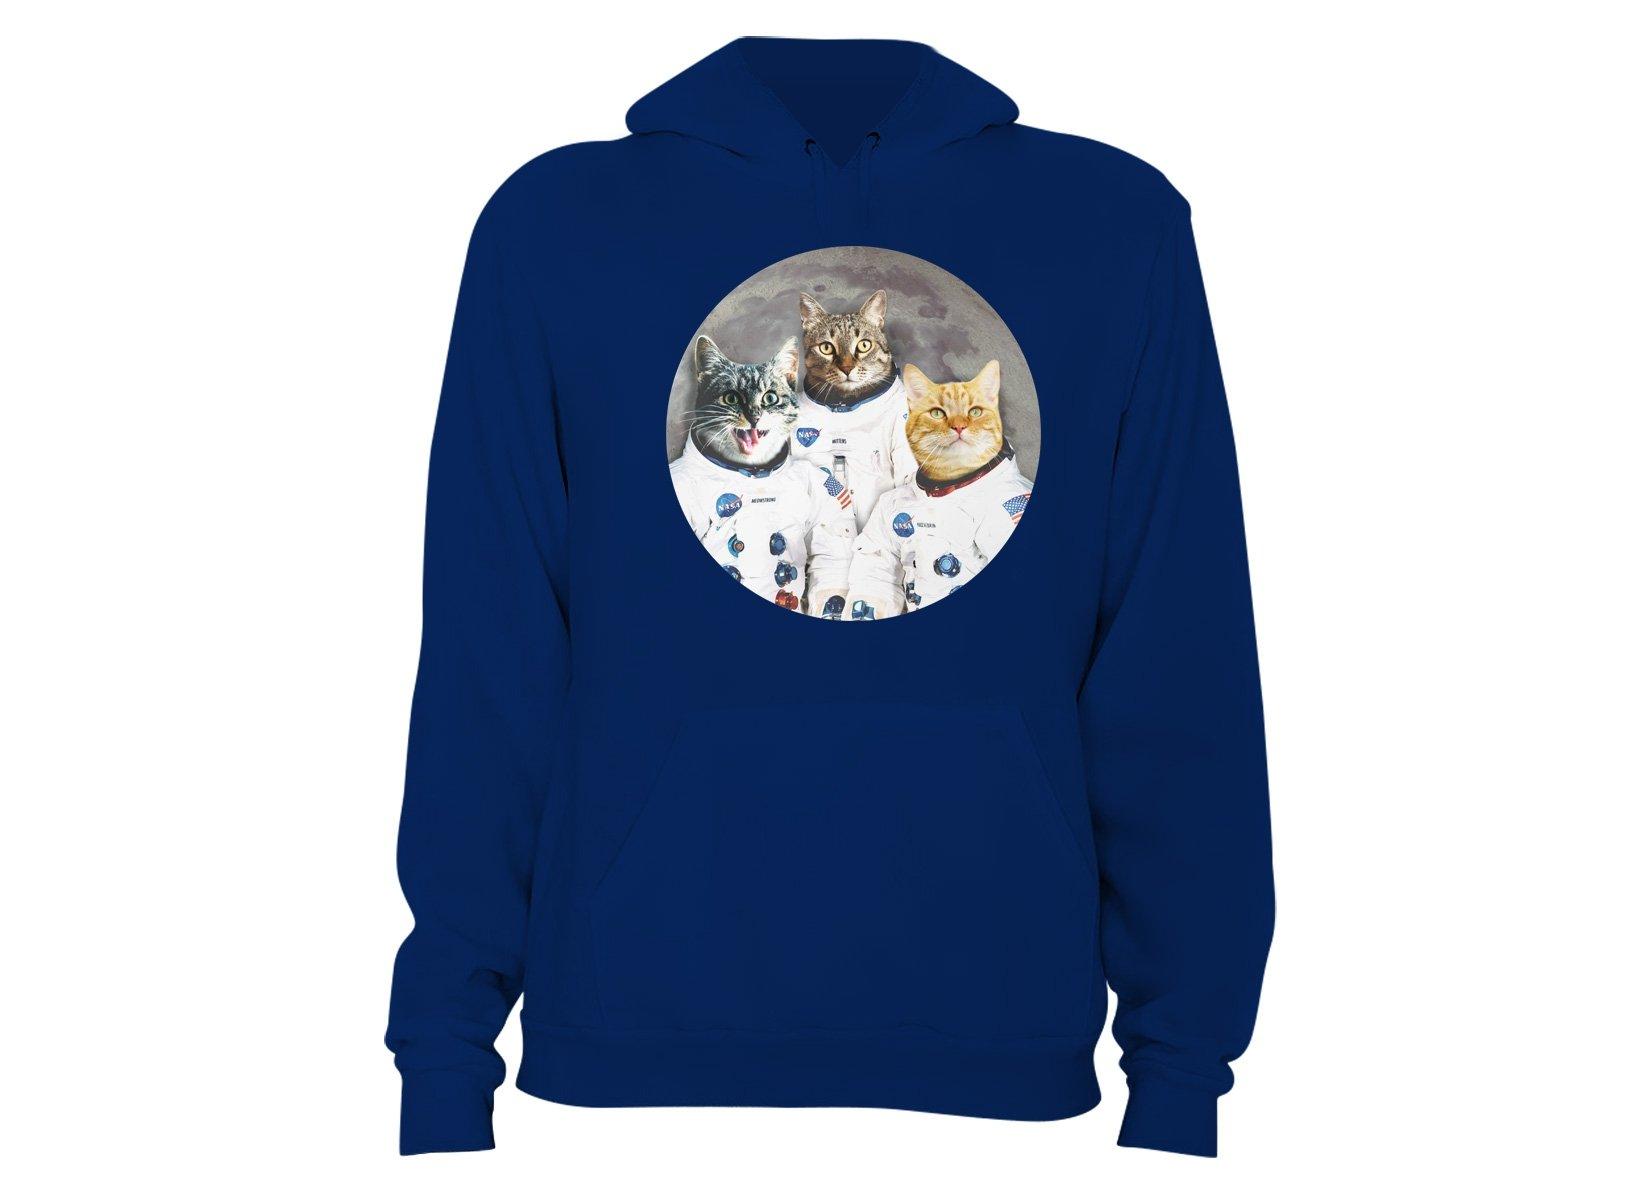 Catstronauts on Hoodie